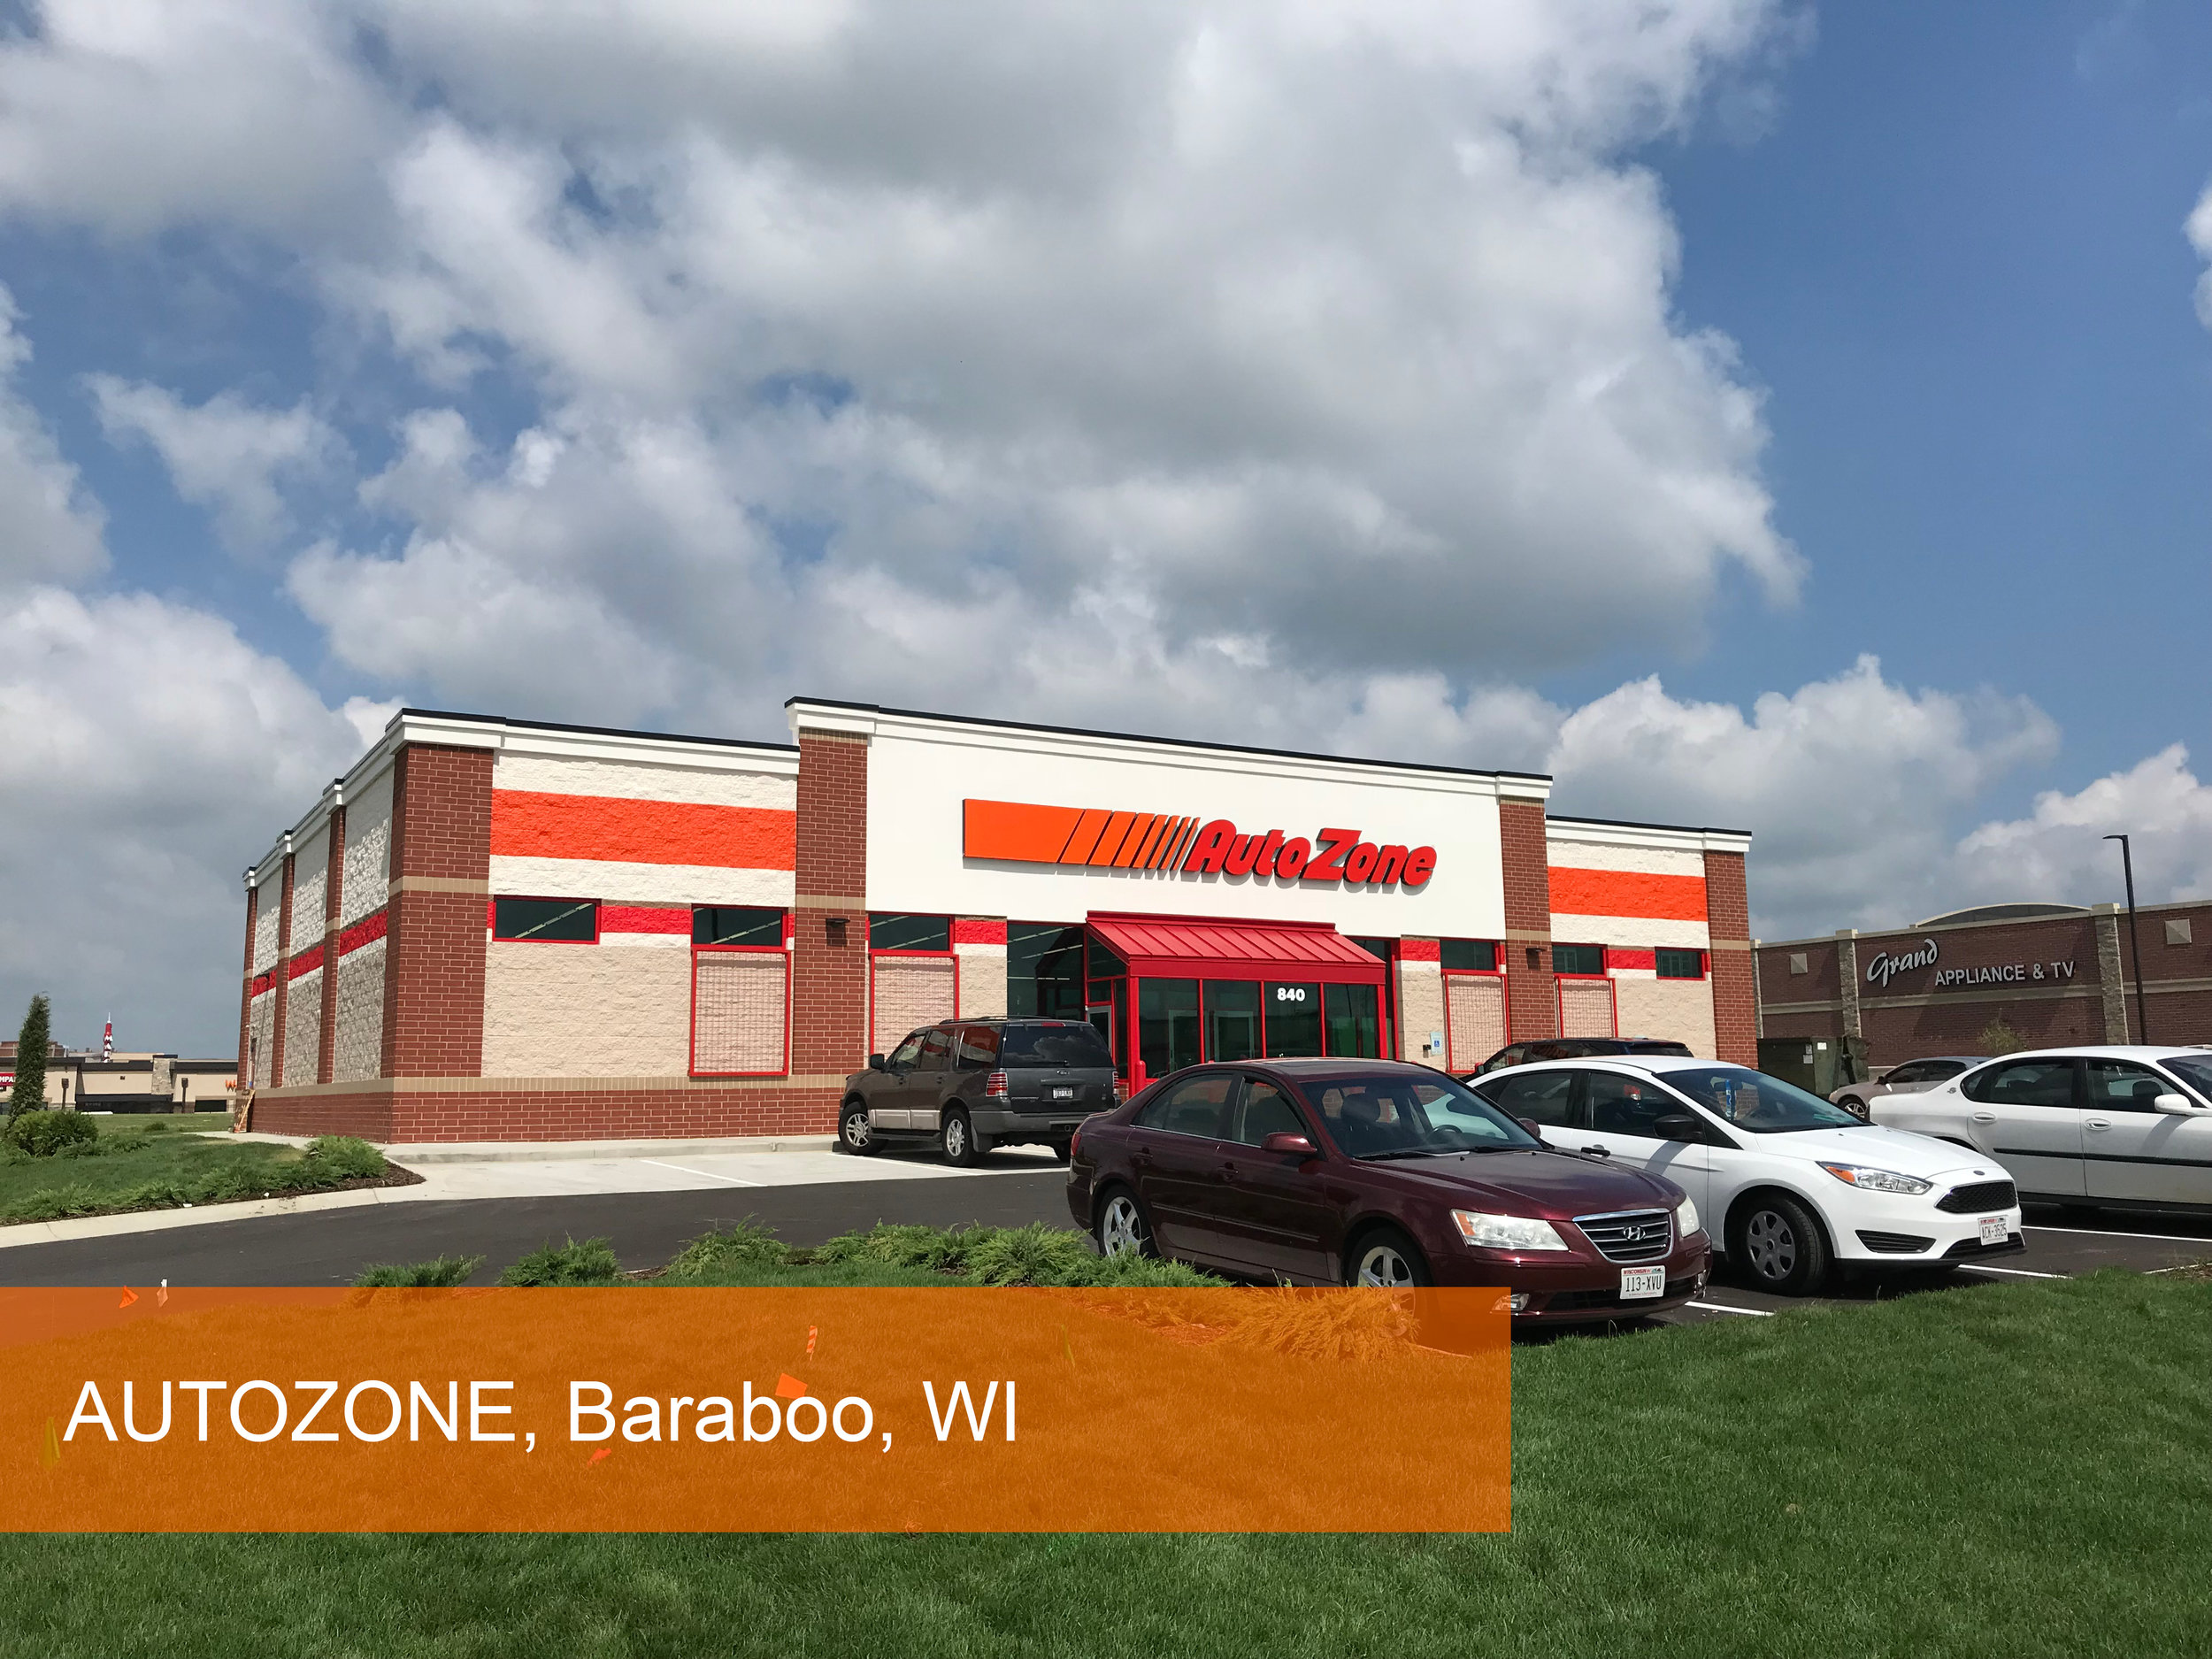 Baraboo, Wisconsin